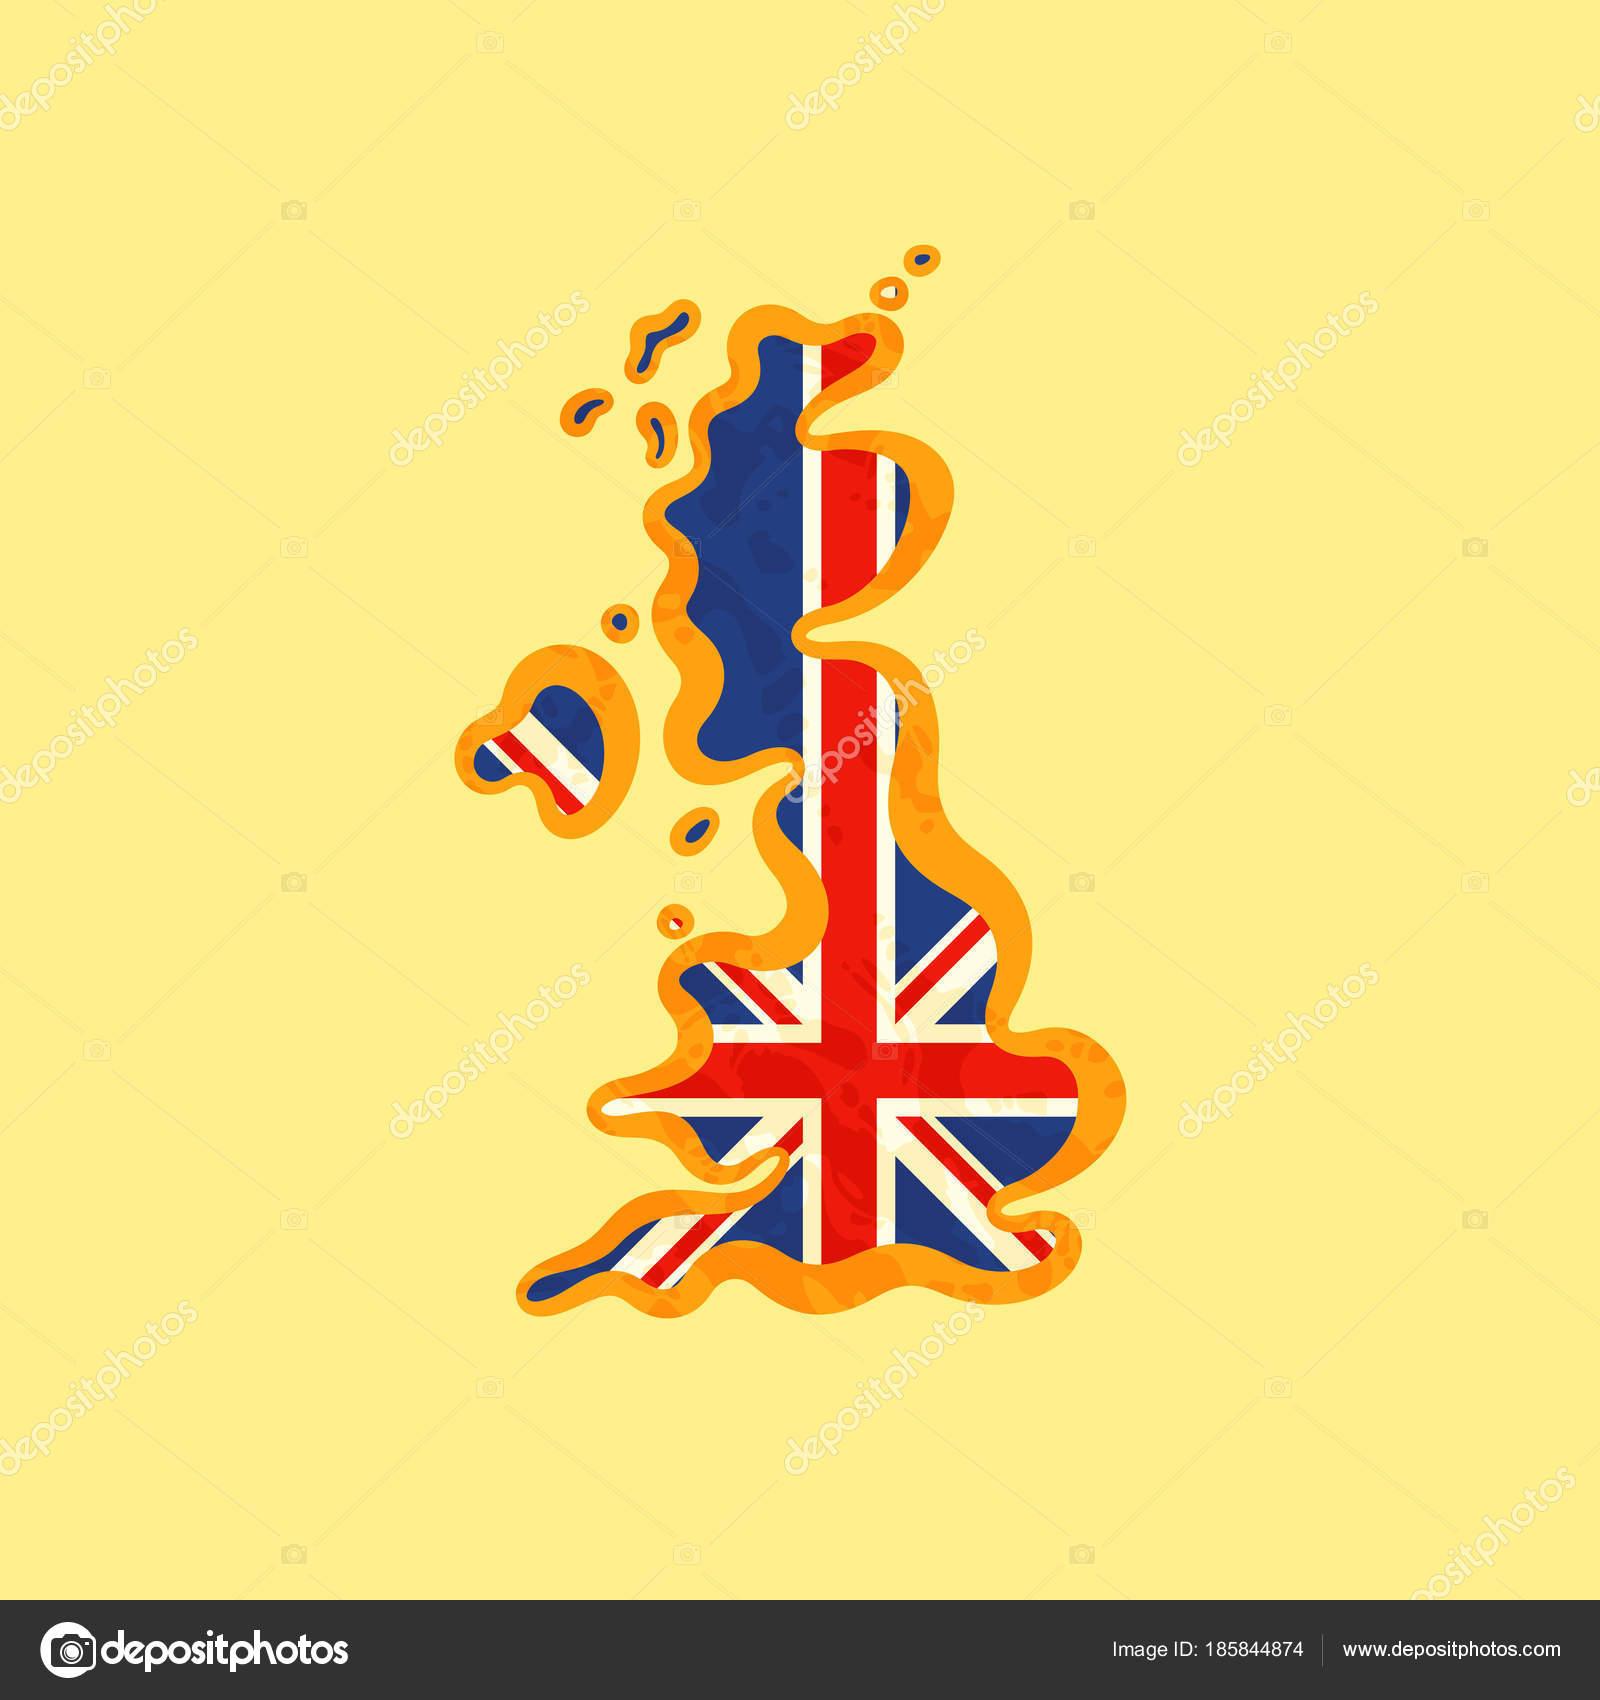 Reino Unido - Mapa coloreado con bandera británica — Vector de stock ...